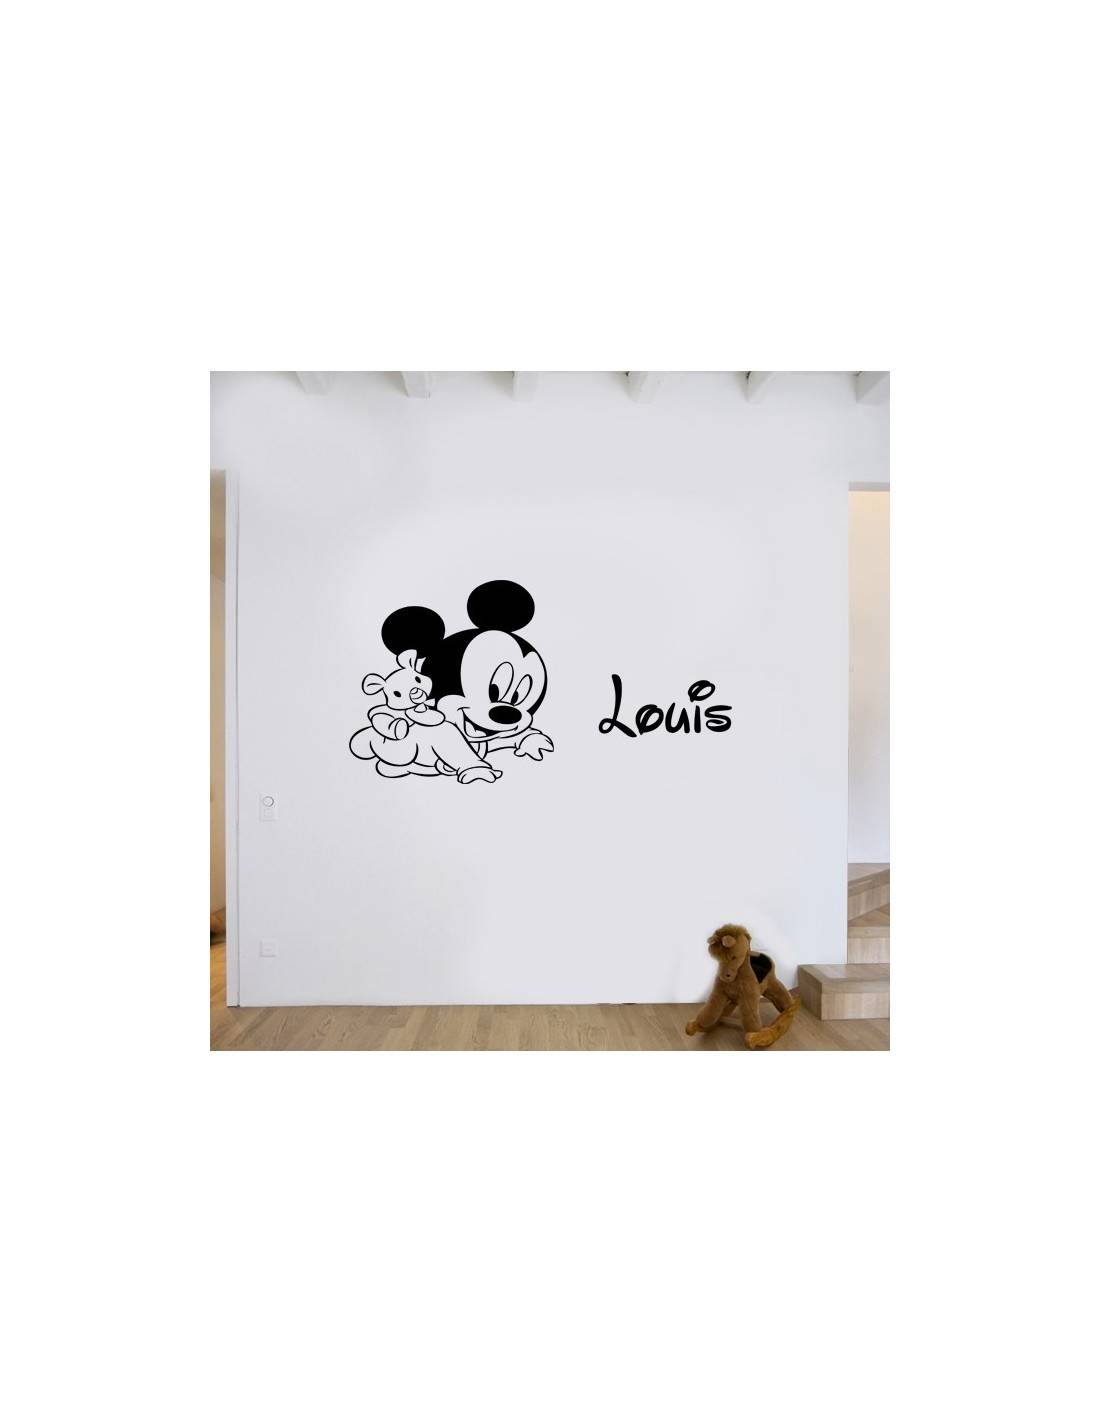 Stickers Deco Enfant Mickey Personnalise Stickers Enfant Pas Cher